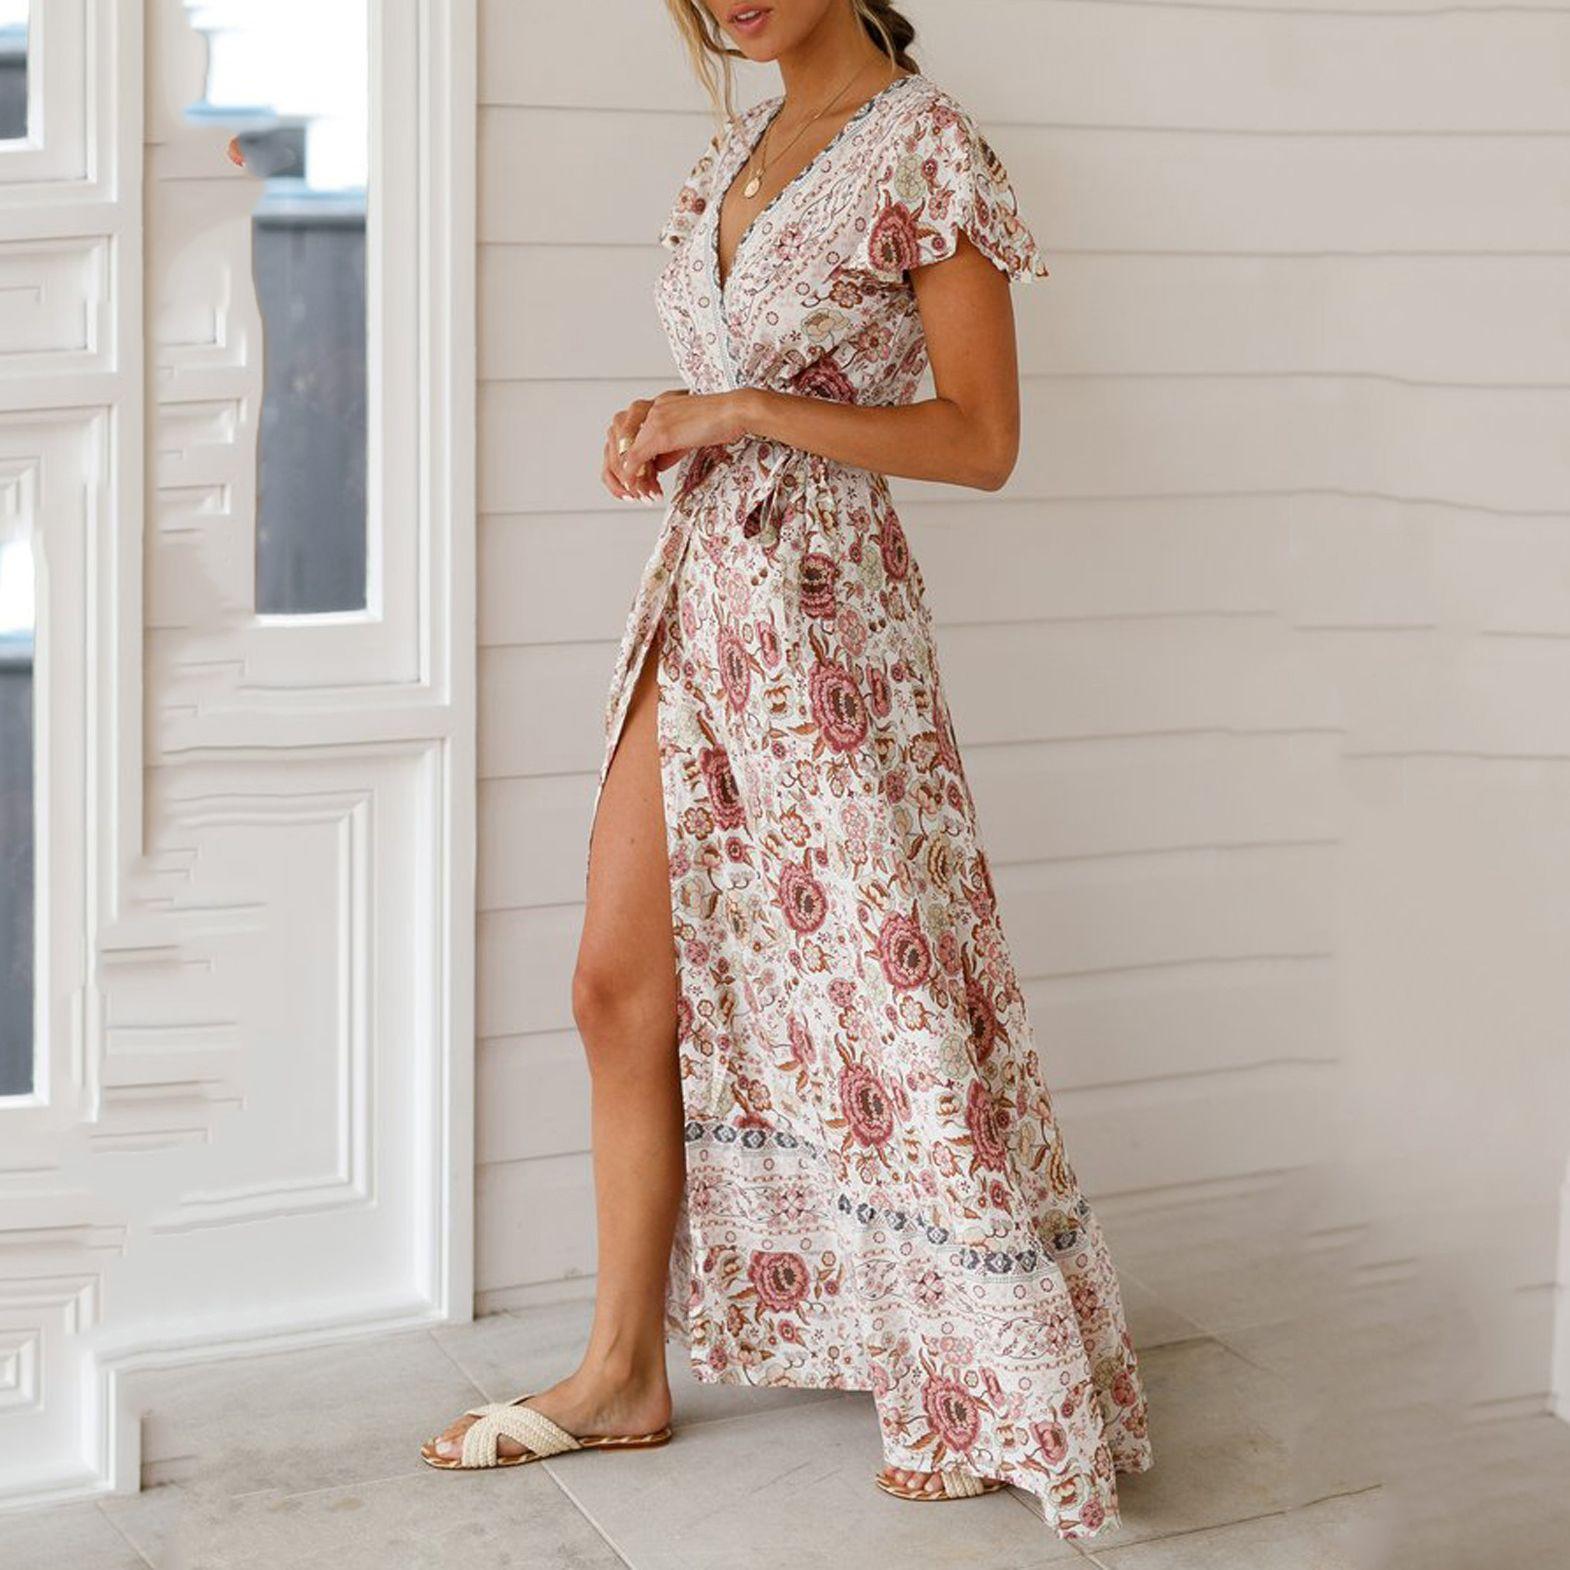 Bohemian Big Pendulum V Neck Beach Holiday Tie Printing Dresses Casual Boho Boho Dress Maxi Dress [ 1570 x 1570 Pixel ]